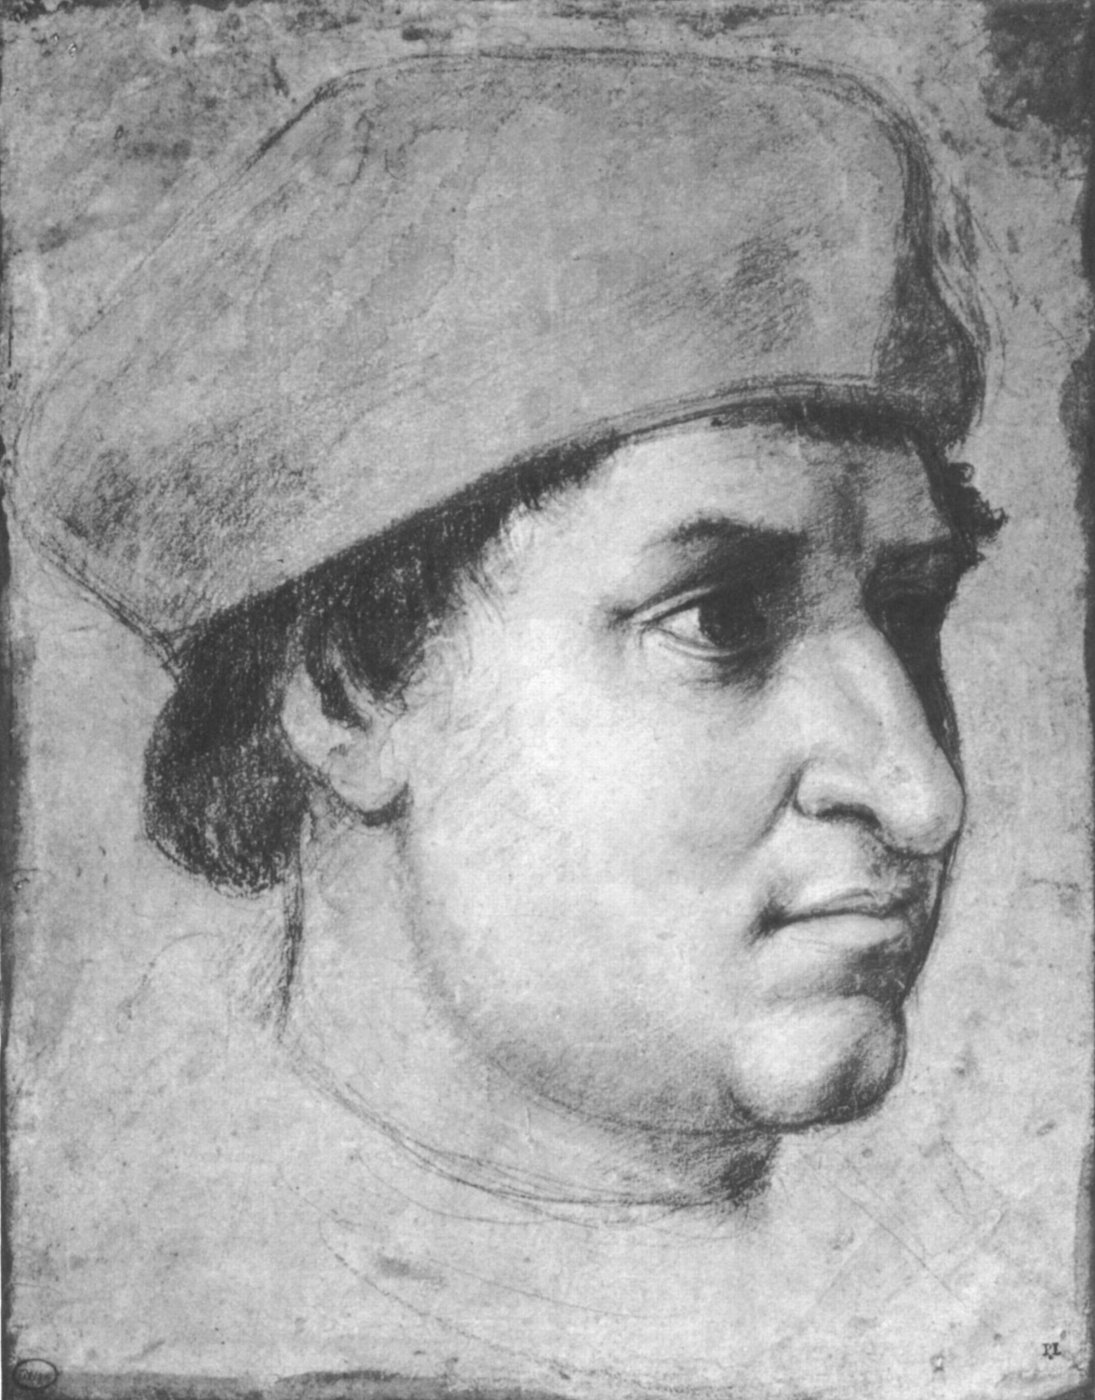 Raphael Sanzio. Portrait of the cardinal. Sketch